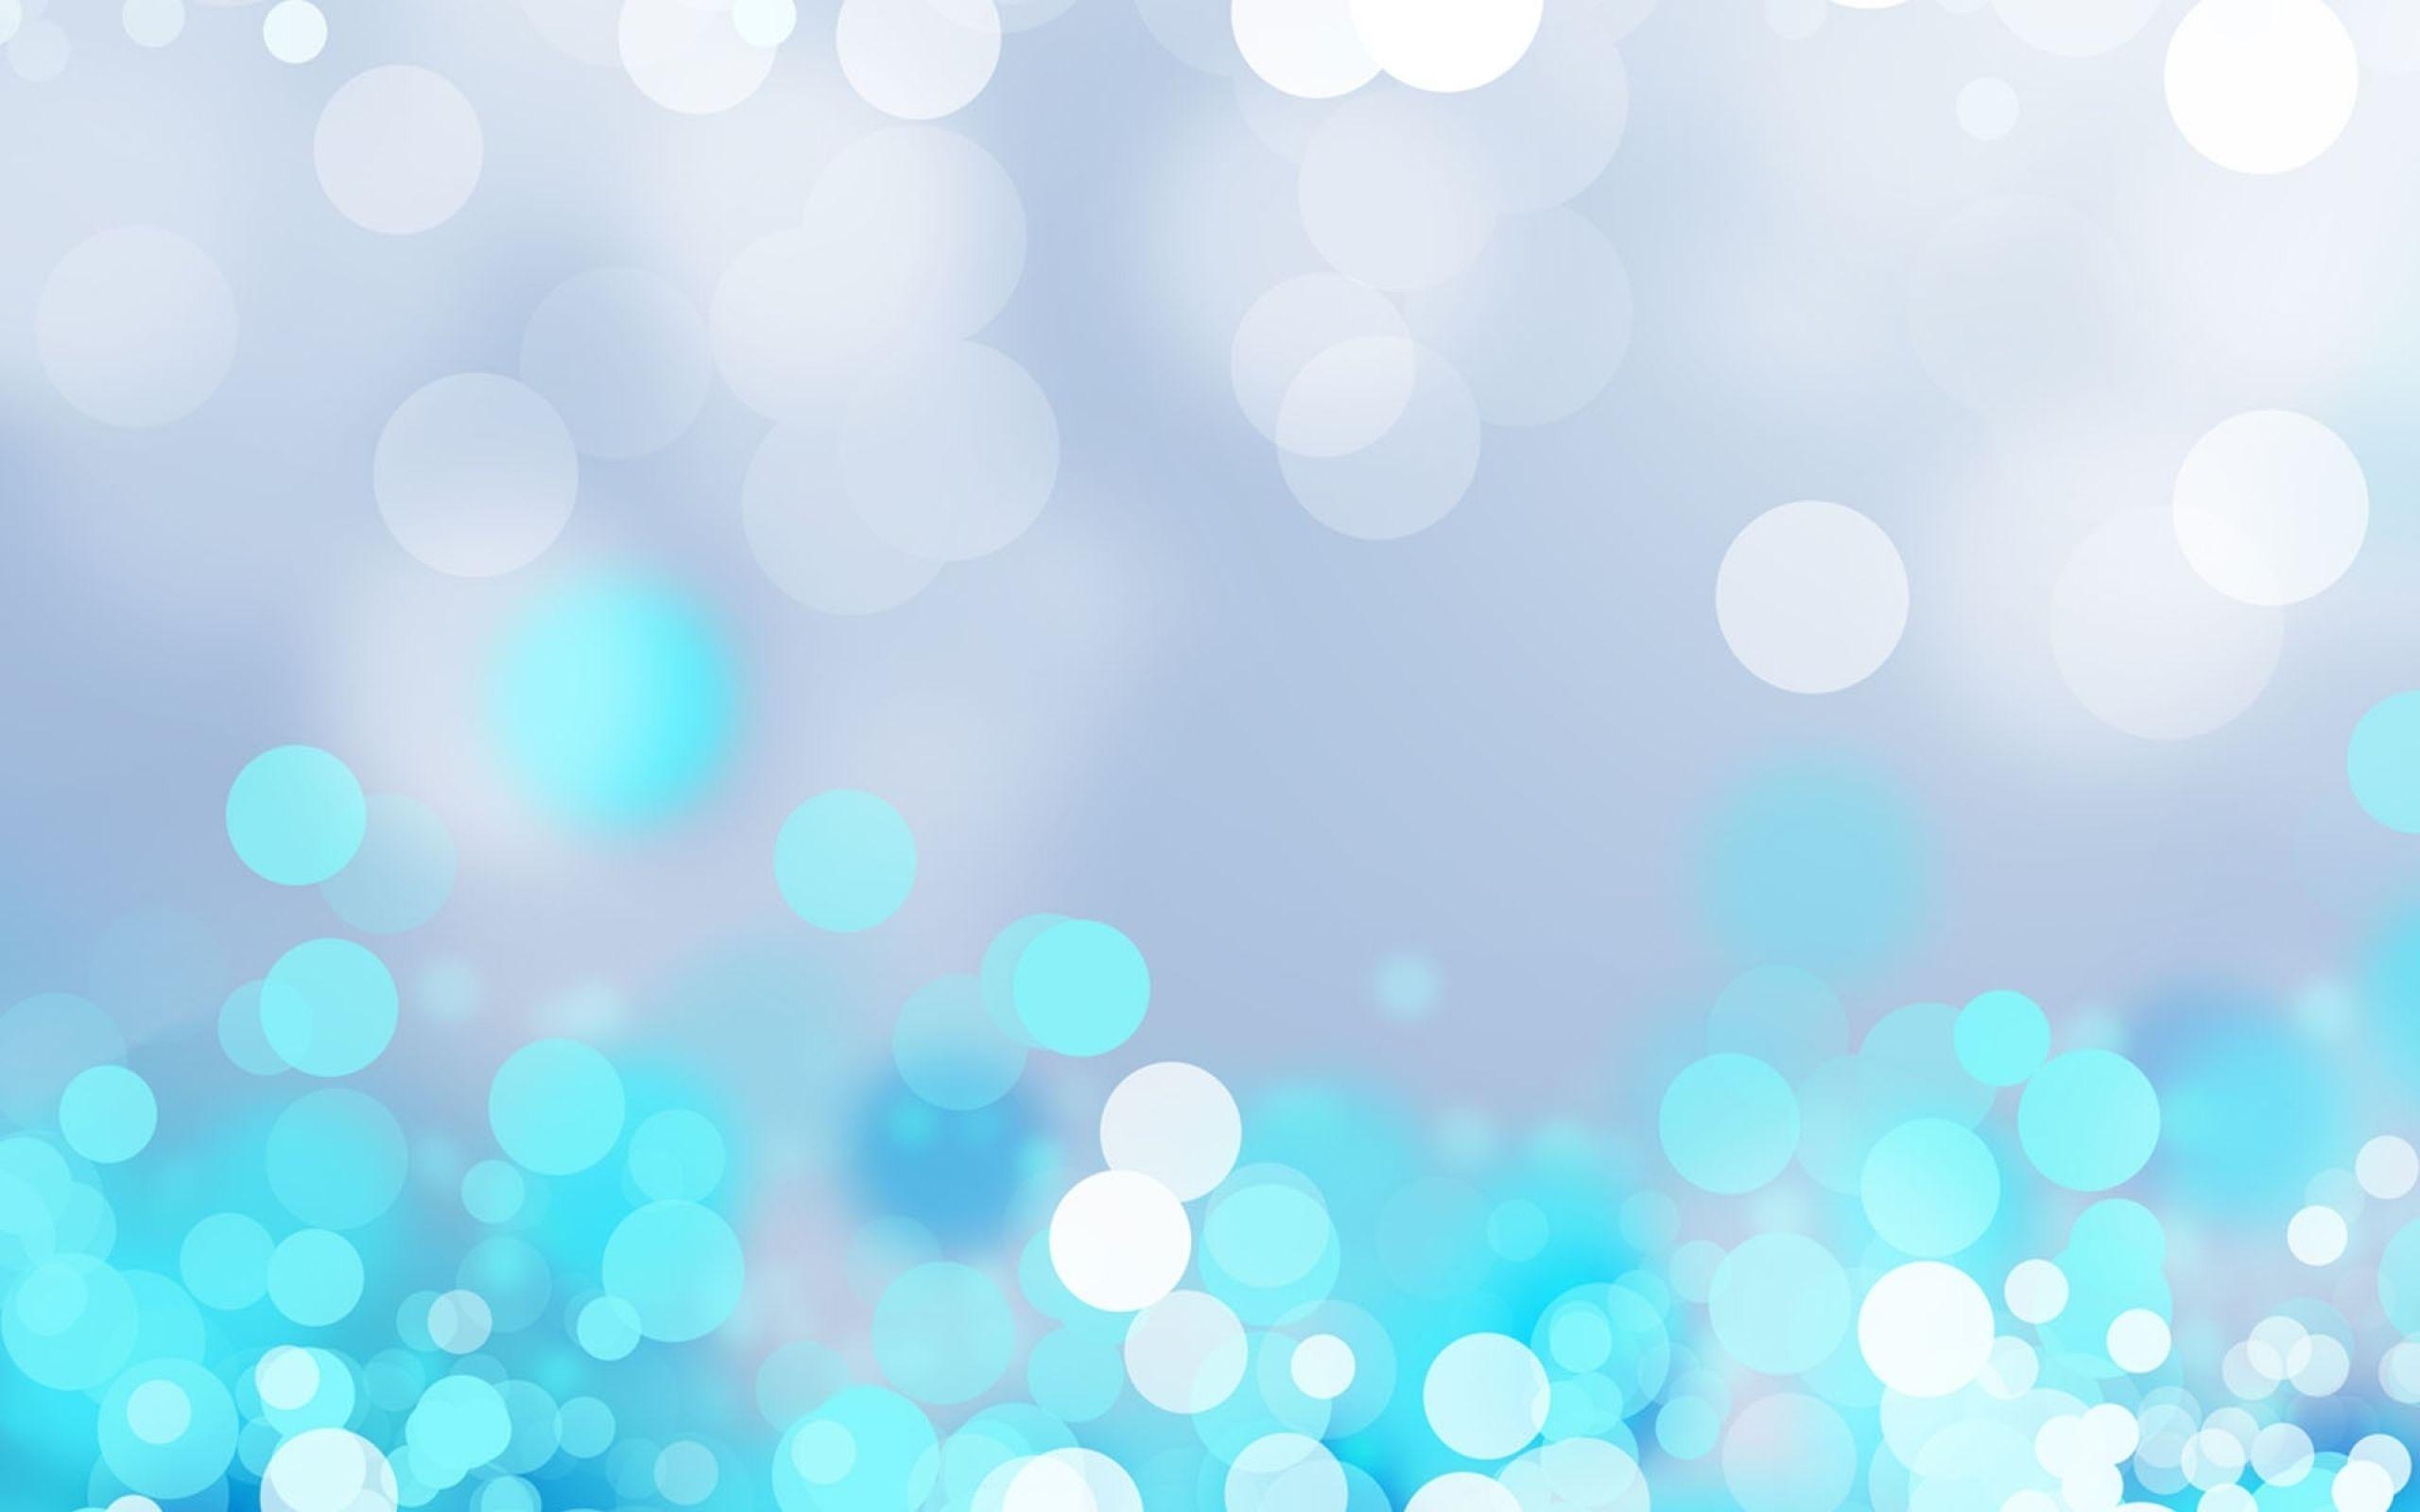 Wallpapers For Cute Light Blue Wallpaper 2560x1600